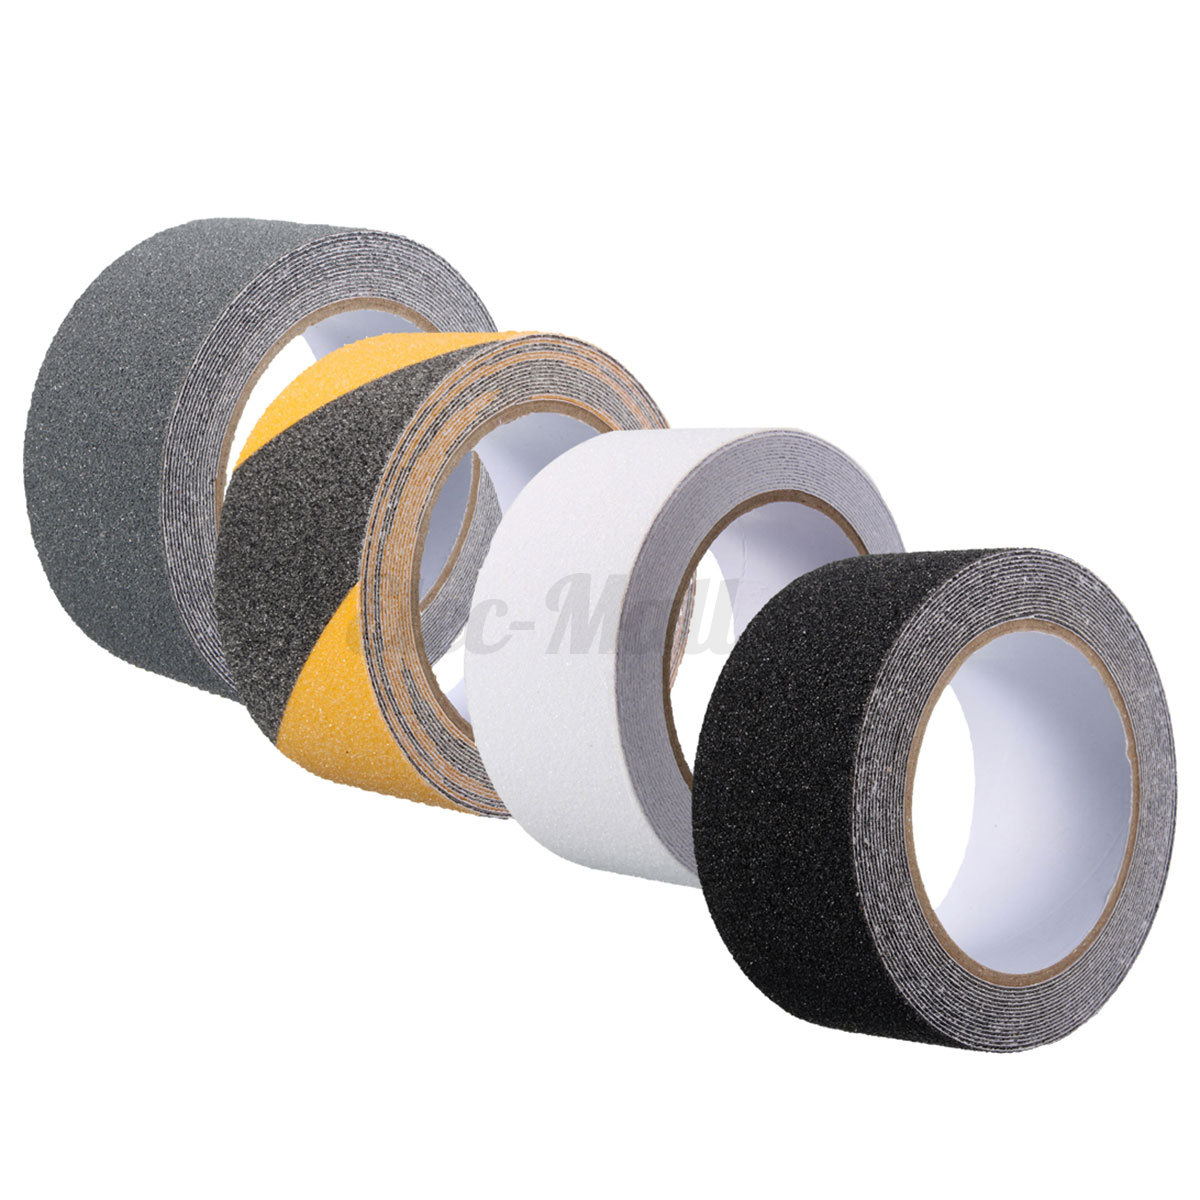 Floor Safety Non Skid Tape Roll Anti Slip Adhesive Stickers High Grip 1m 3m